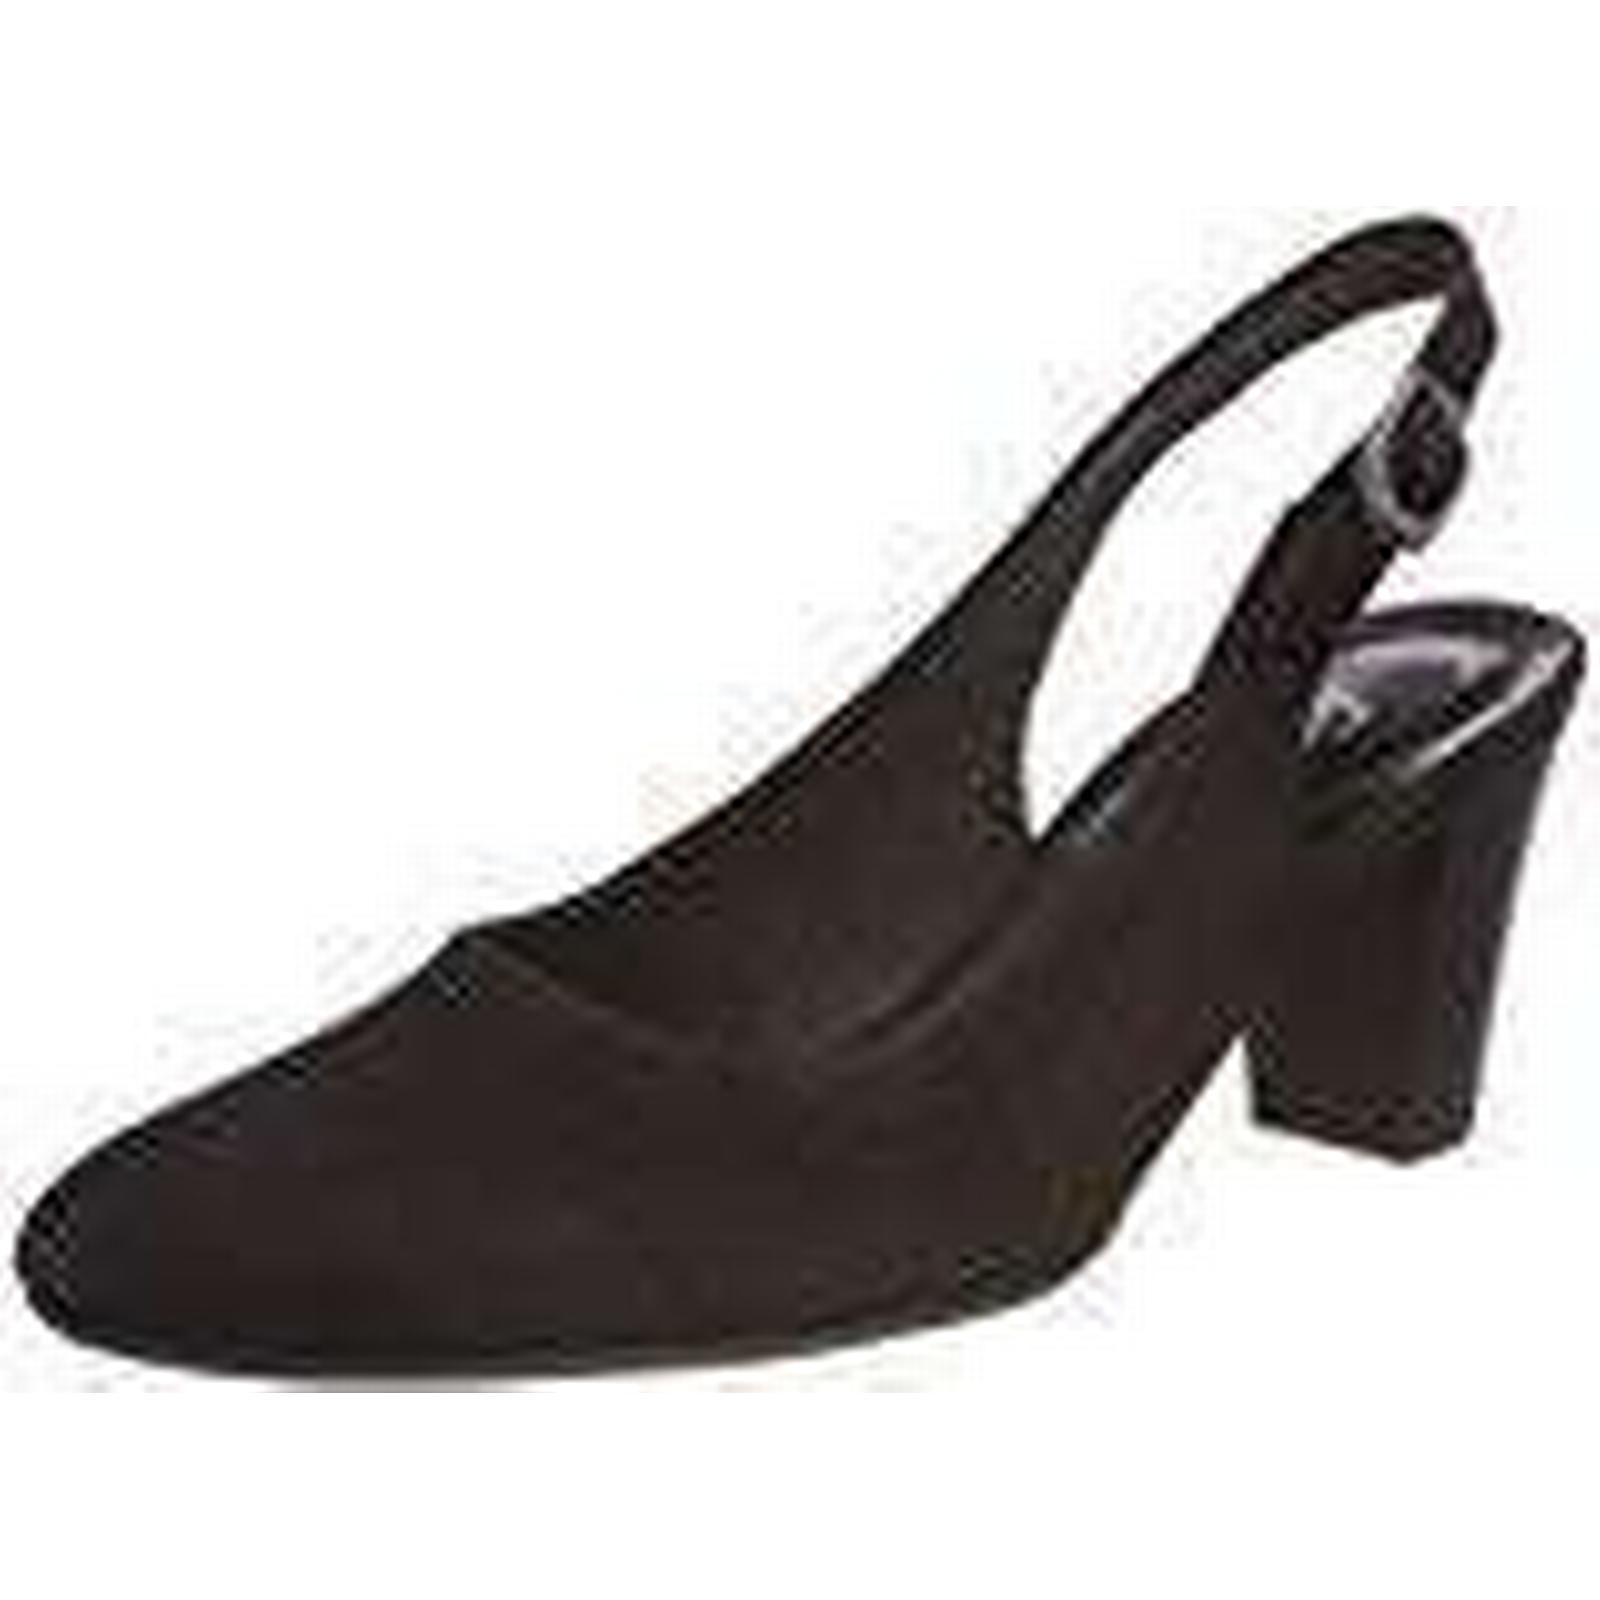 Gabor 47, Women's Comfort Fashion Closed Toe Heels, Black Schwarz 47, Gabor 7 UK 7 UK b9d5a2